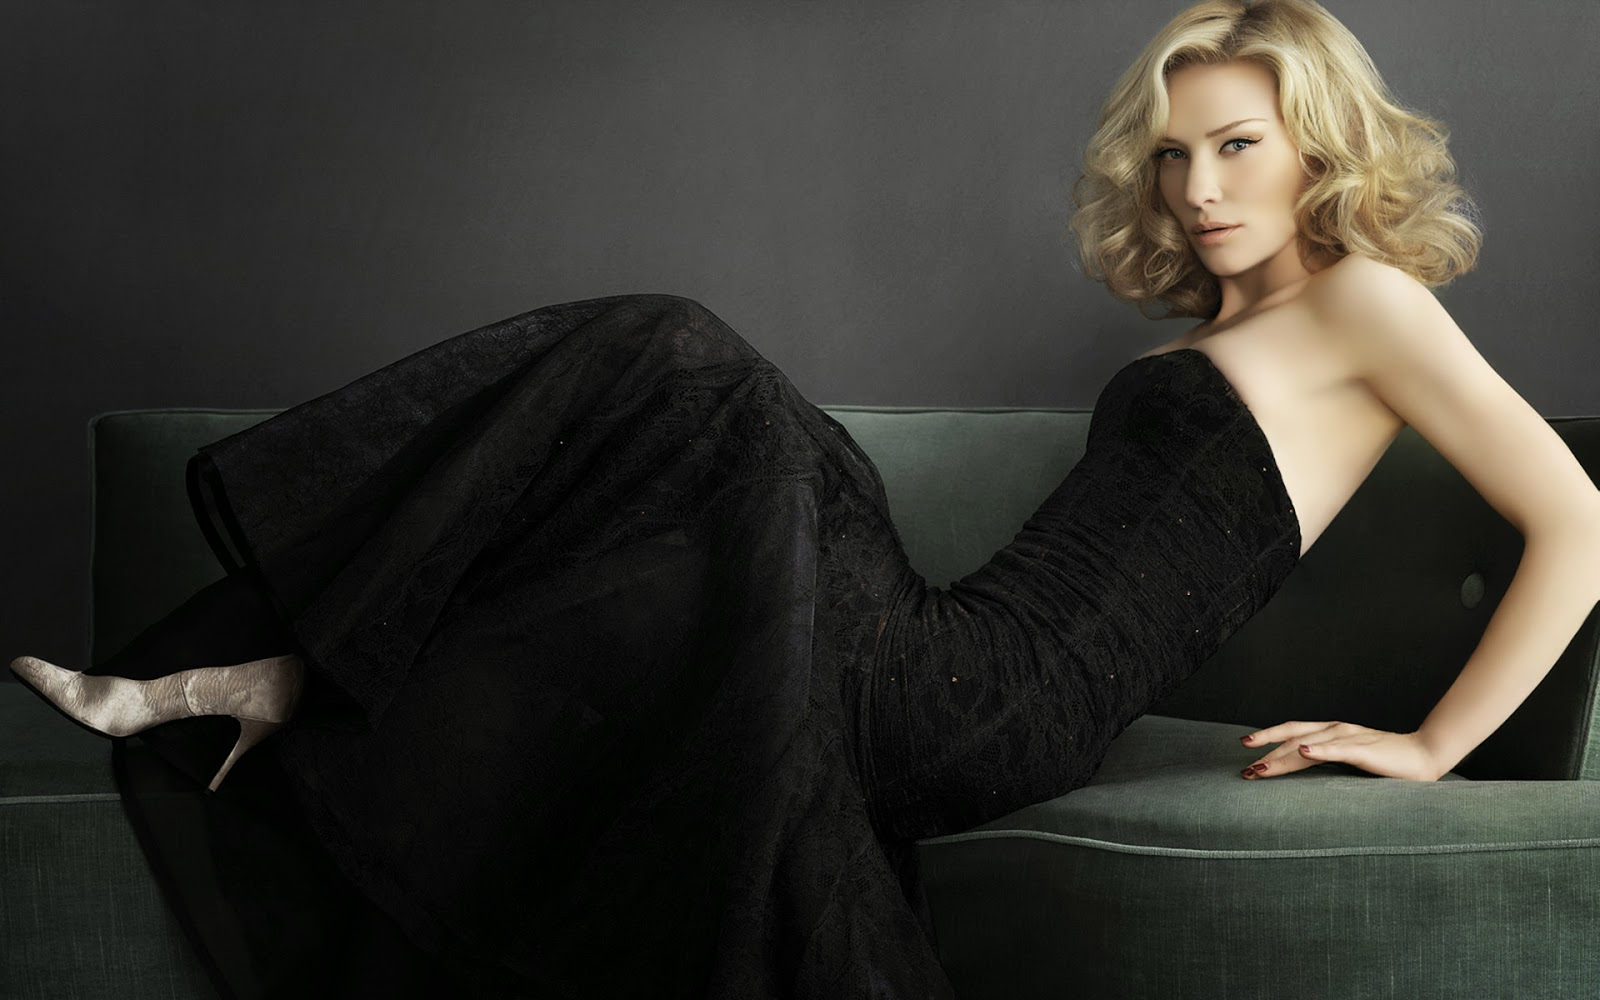 Live World Hollywood Beautiful Actress Wallpaper 1600x1000